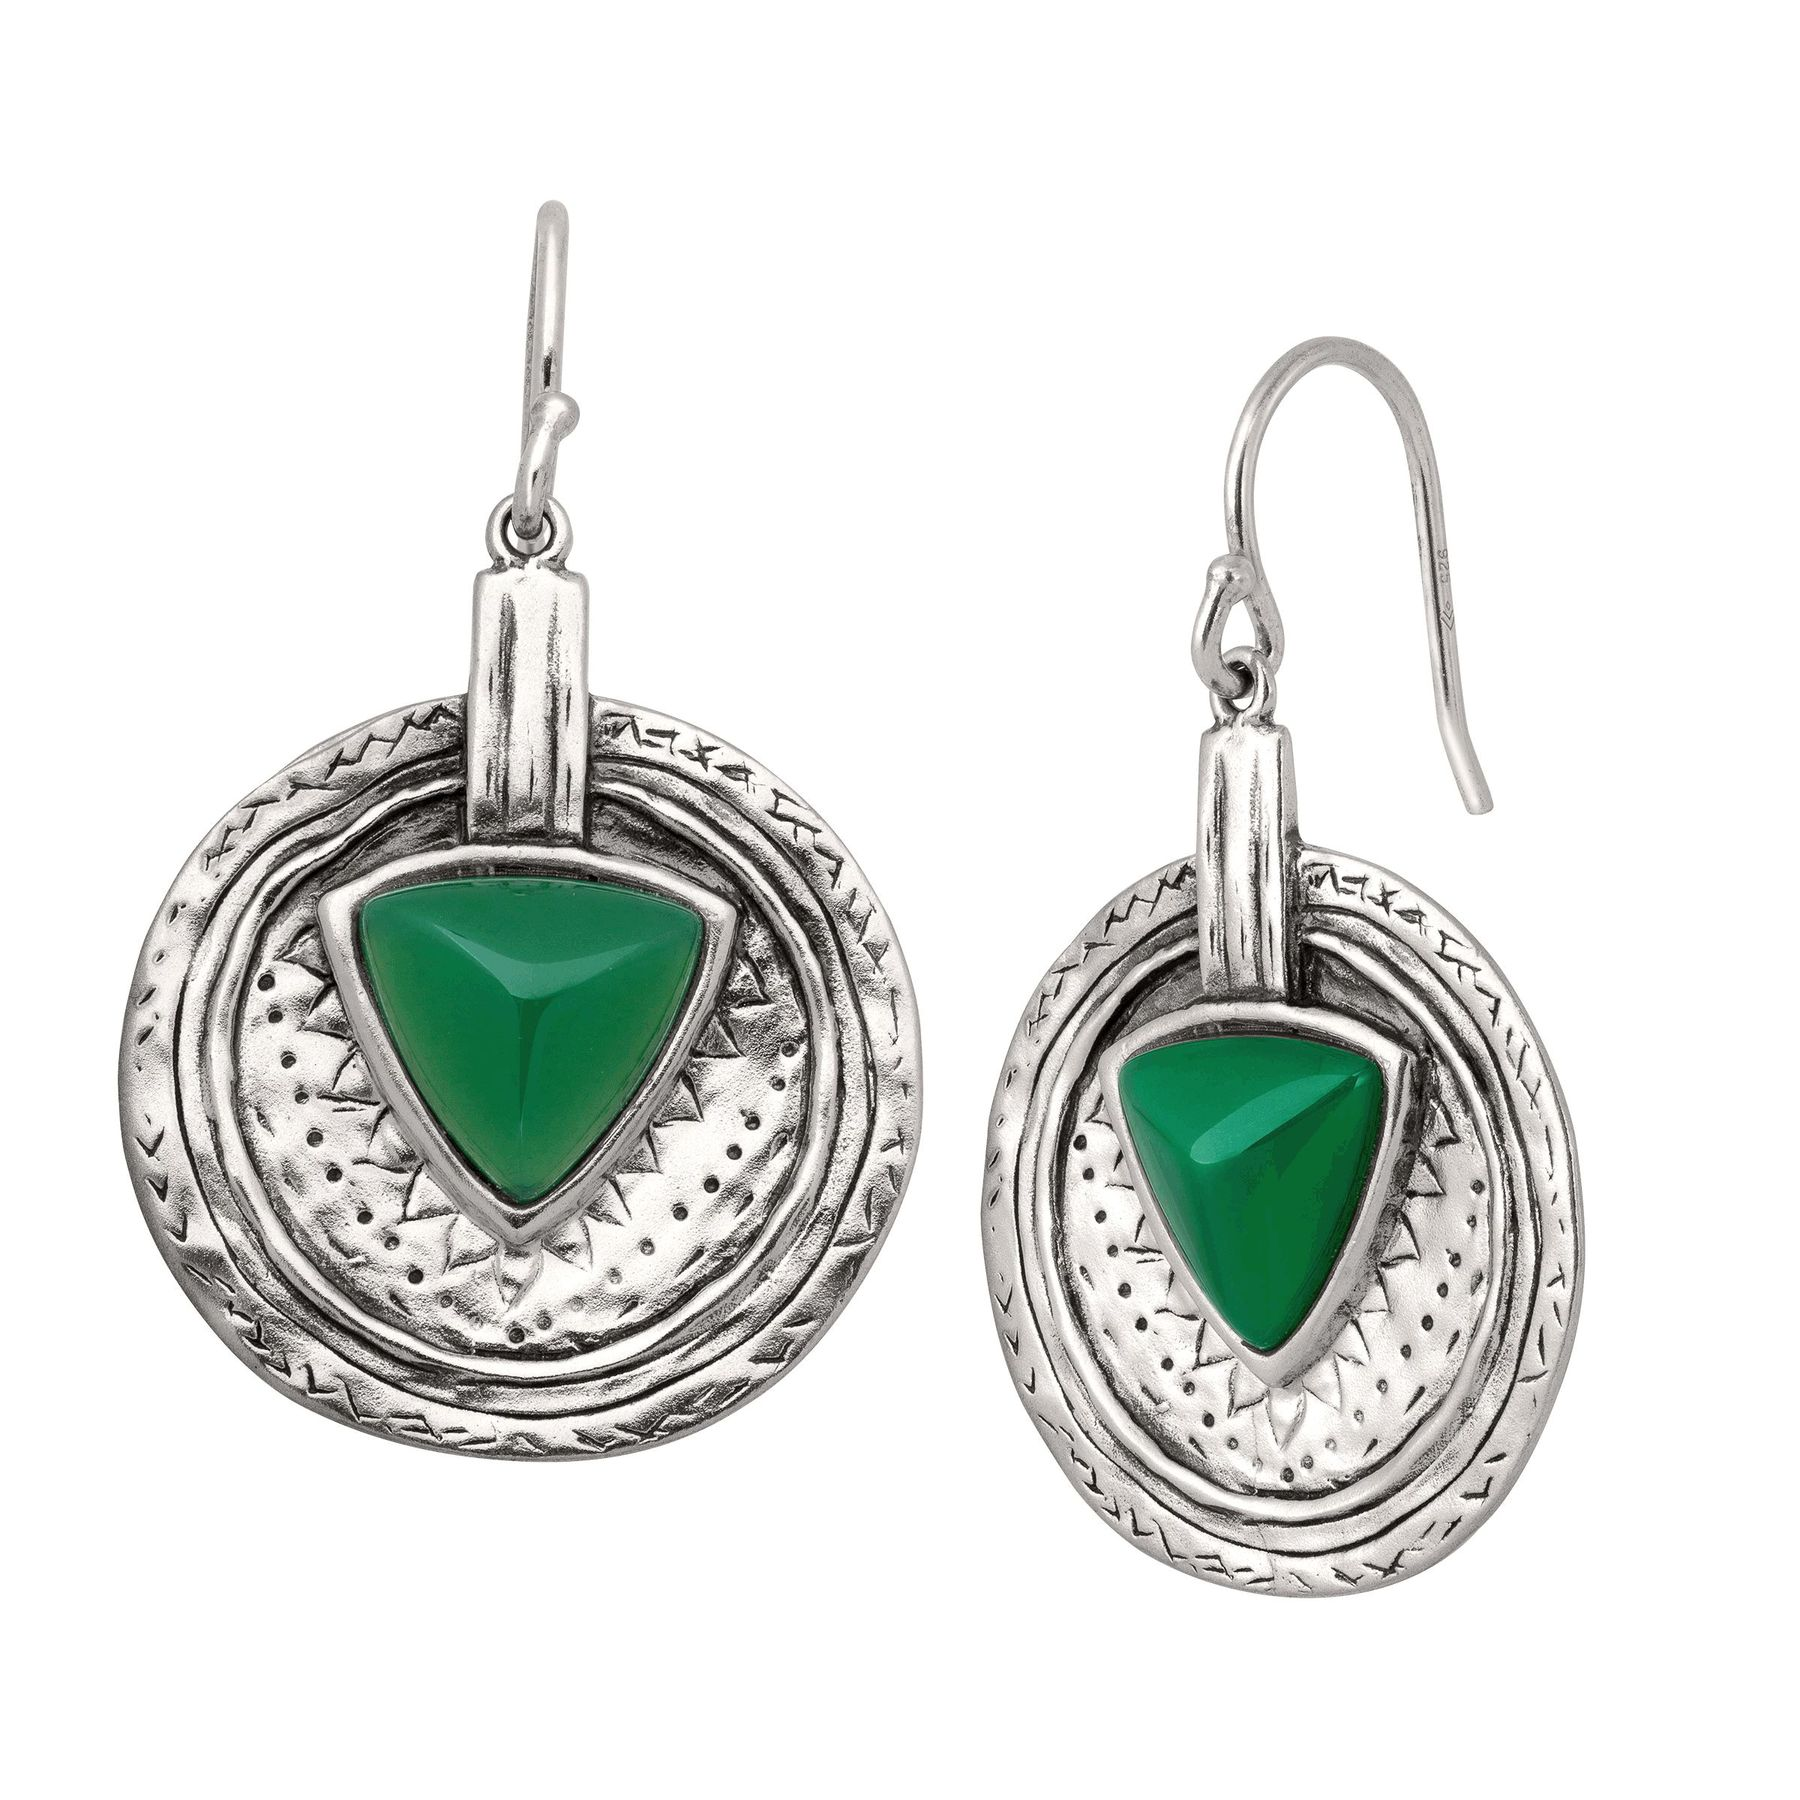 Silpada /'Emerald Isle/' Natural Green Agate Drop Earrings in Sterling Silver